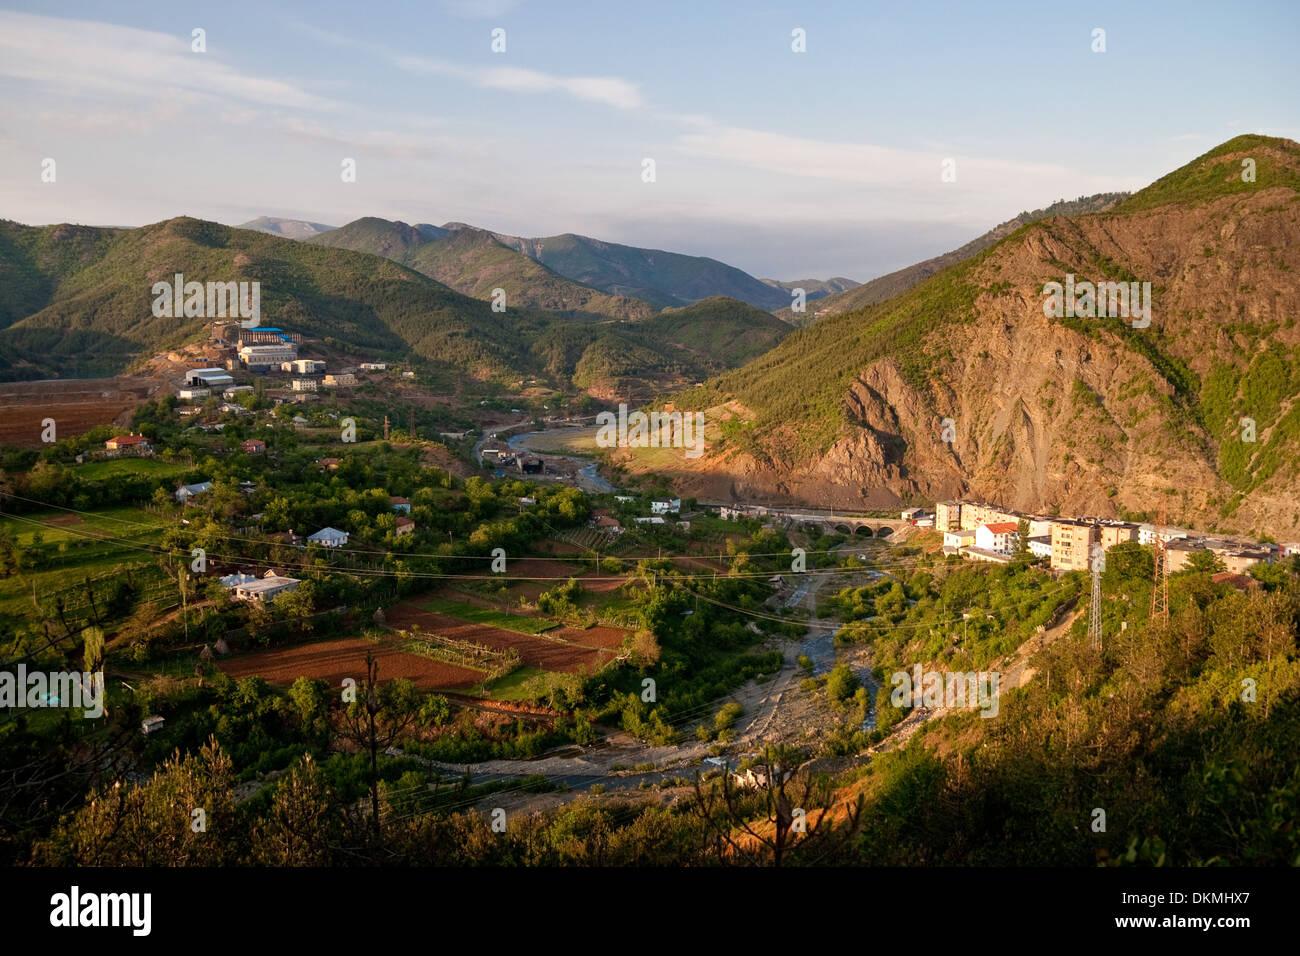 Fushe Arrez, little poor village in northern albania - Stock Image